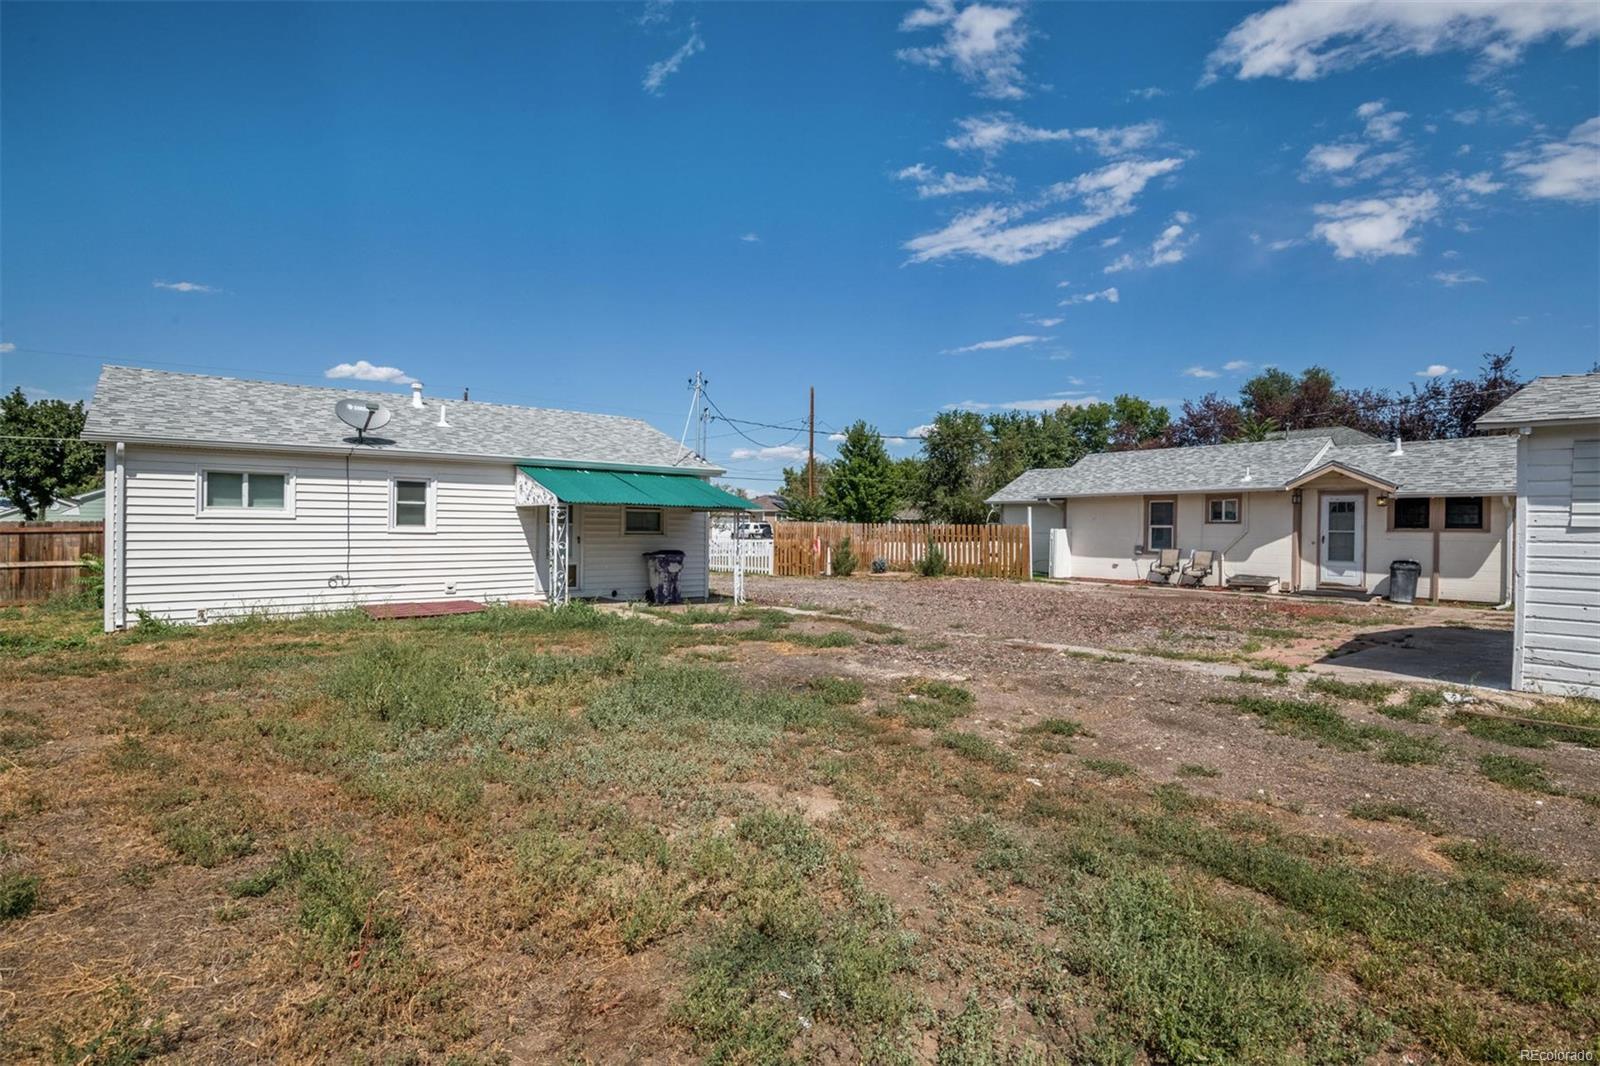 3300 W 55th Avenue, Denver, CO 80221 - Denver, CO real estate listing